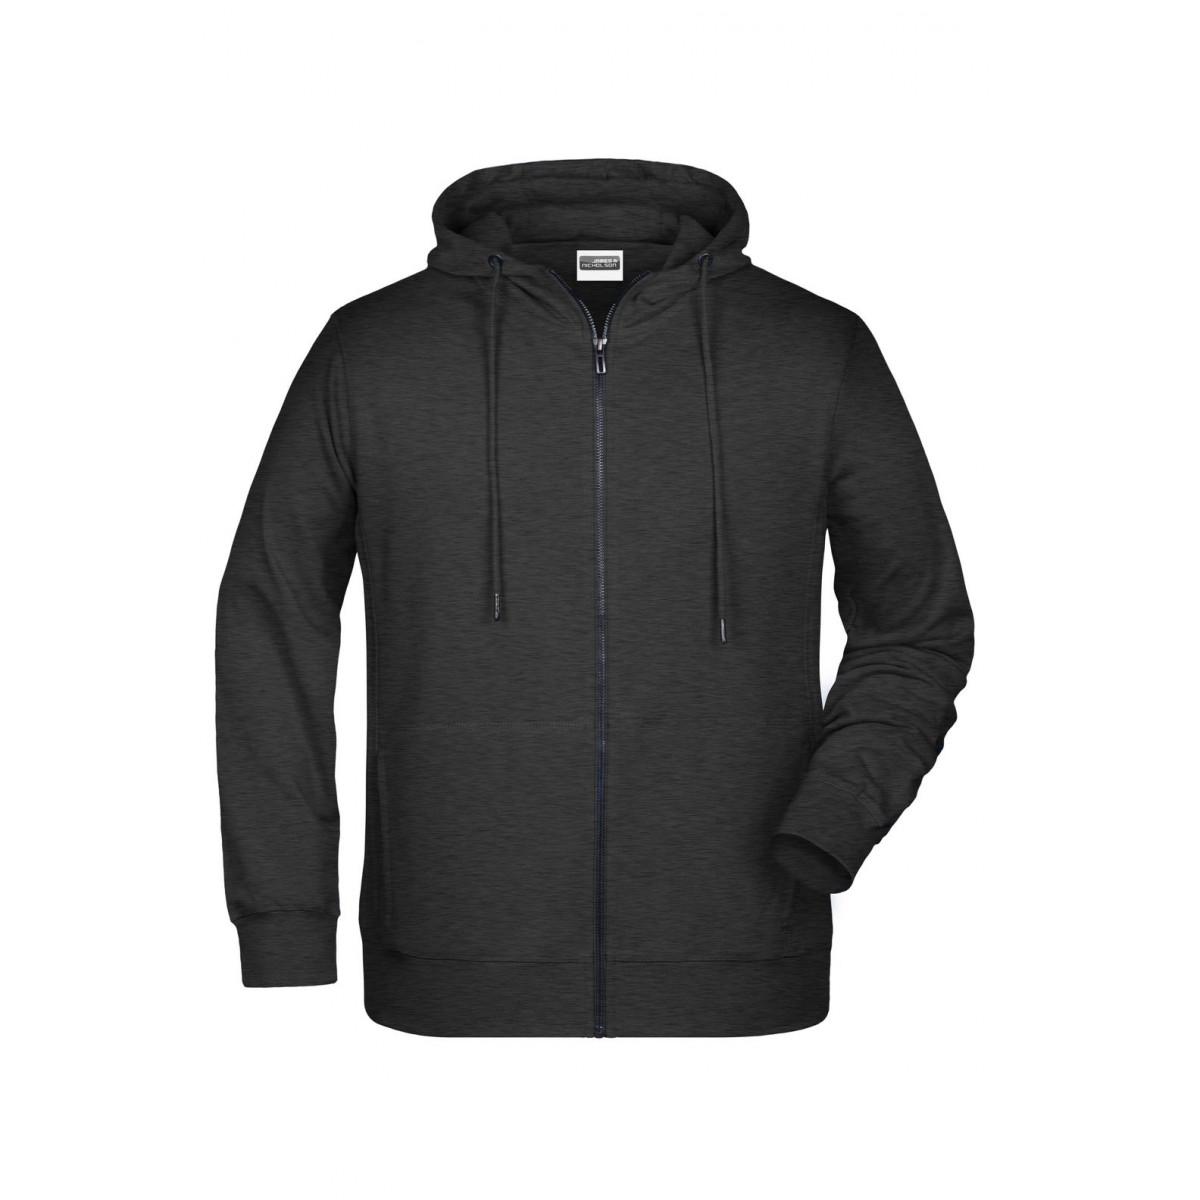 Толстовка мужская 8026 Mens Zip Hoody - Черный меланж